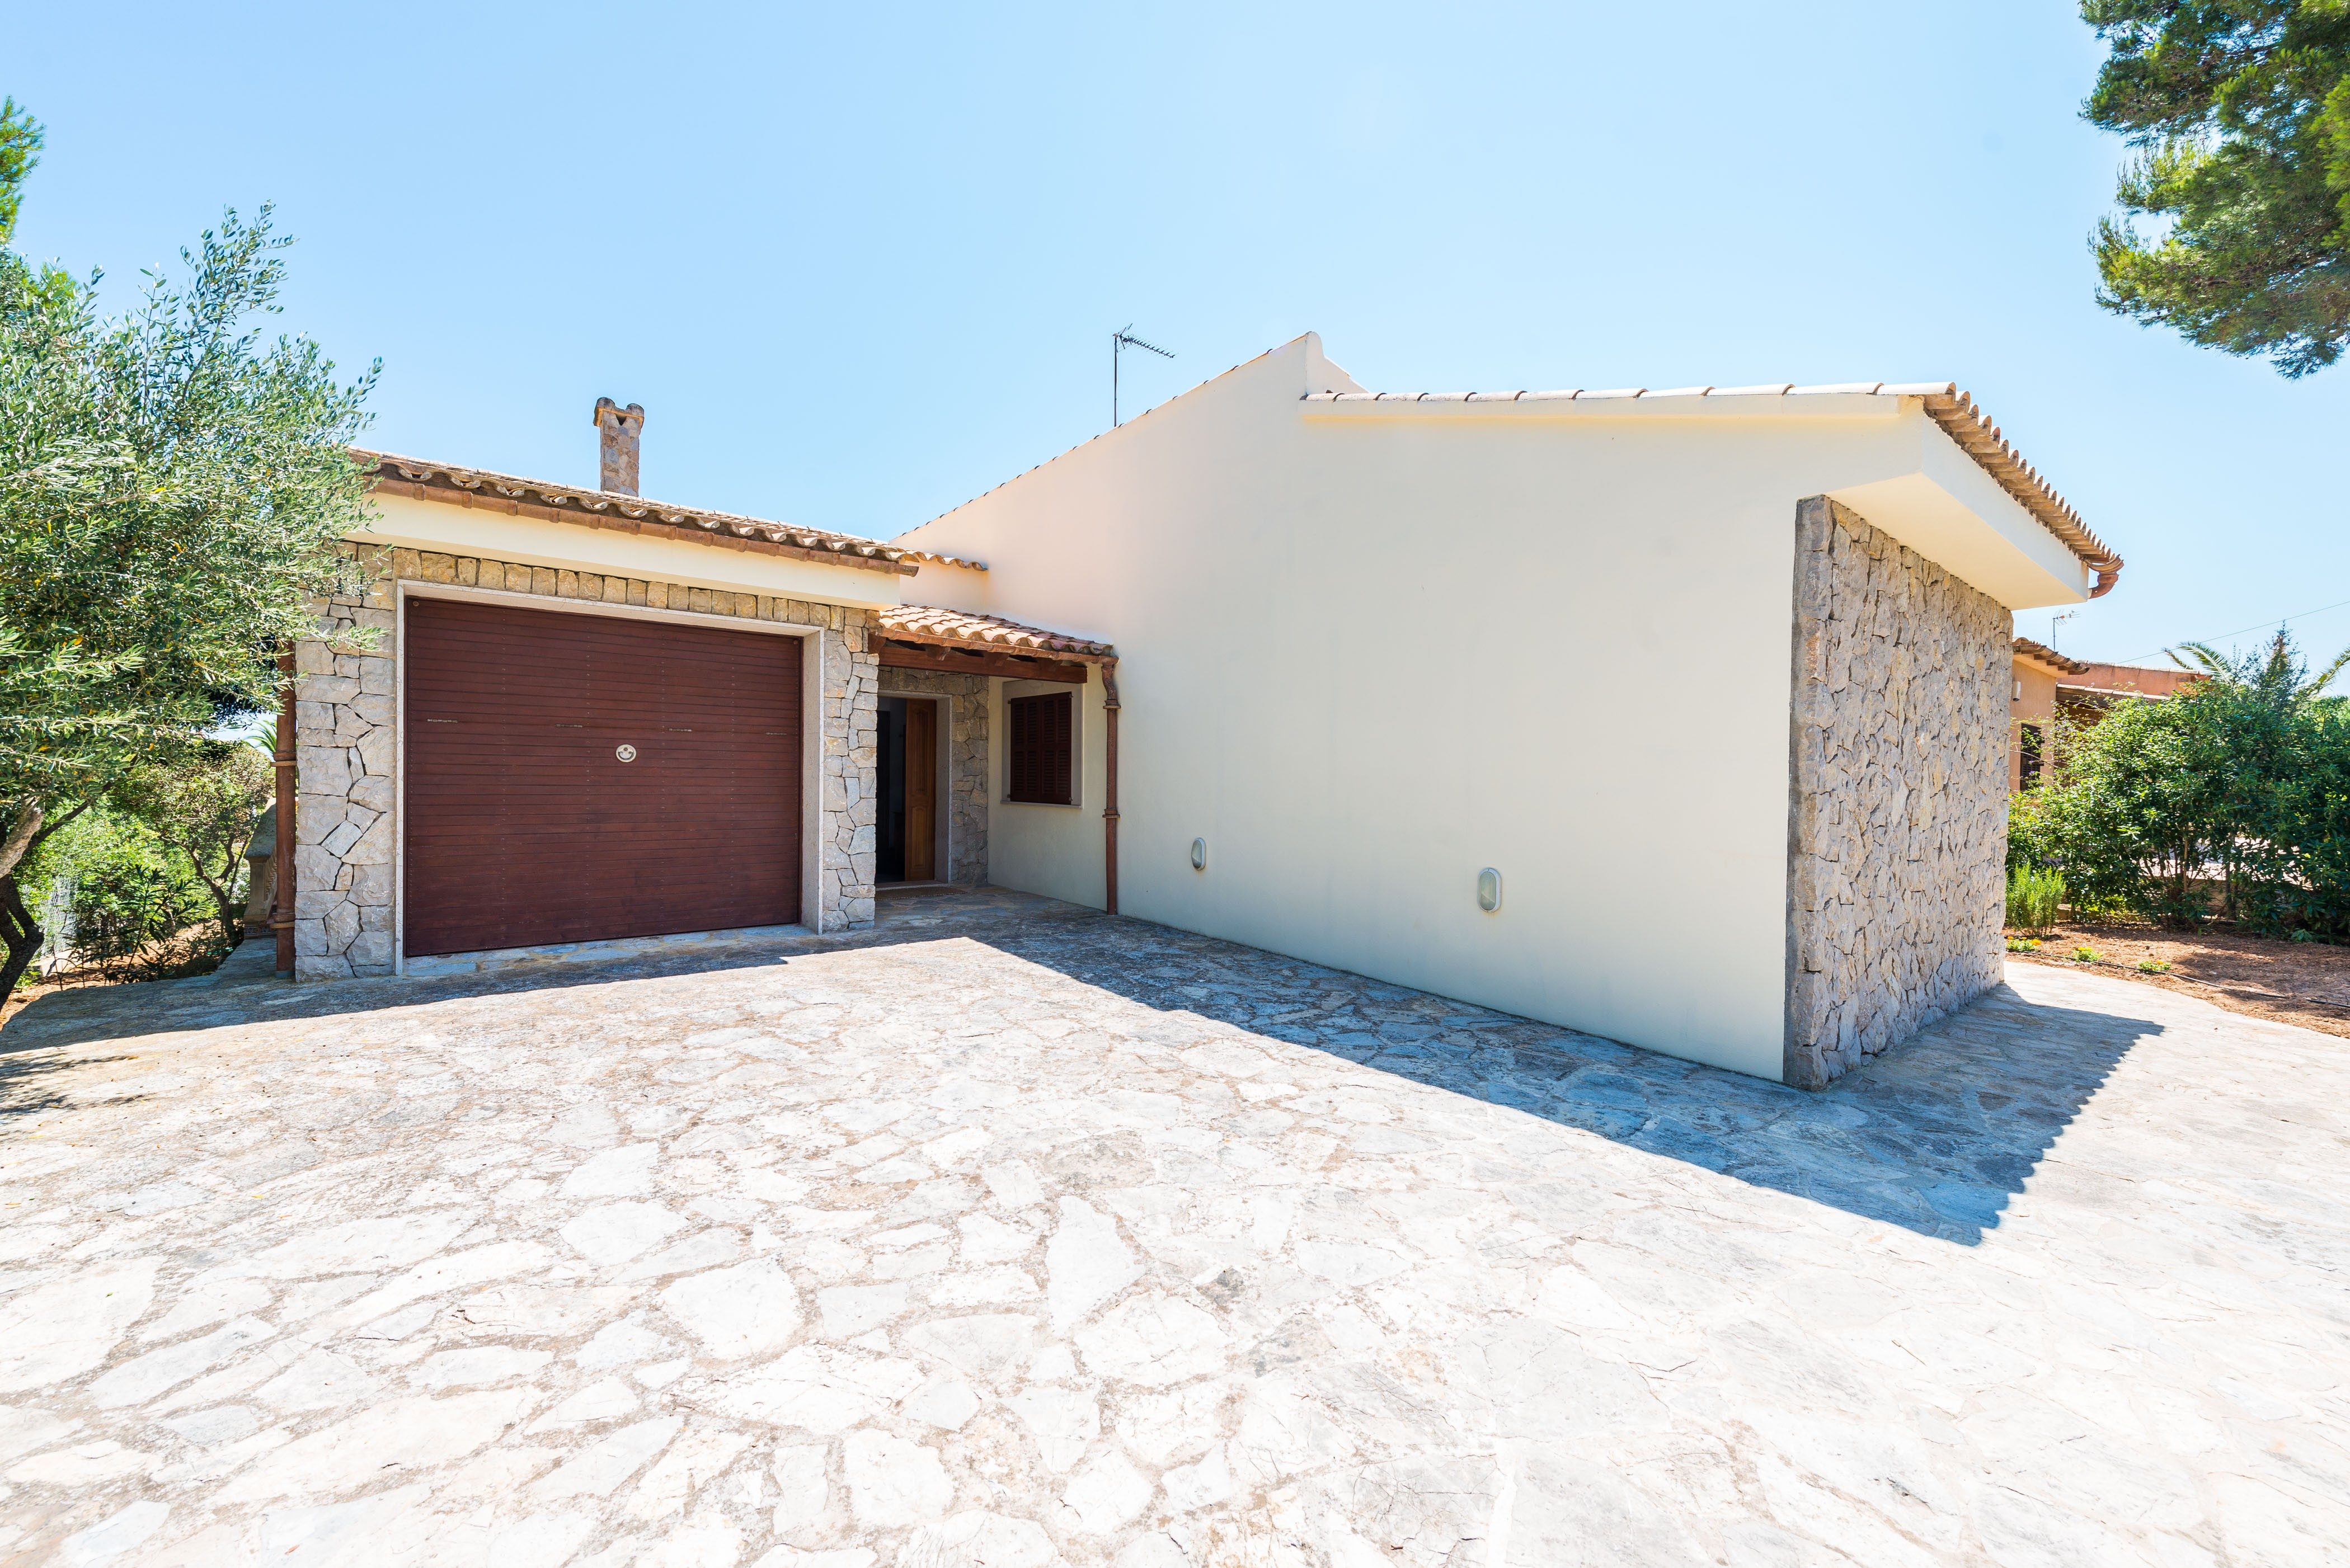 Ferienhaus PLATO (1871745), Cala Mandia, Mallorca, Balearische Inseln, Spanien, Bild 20